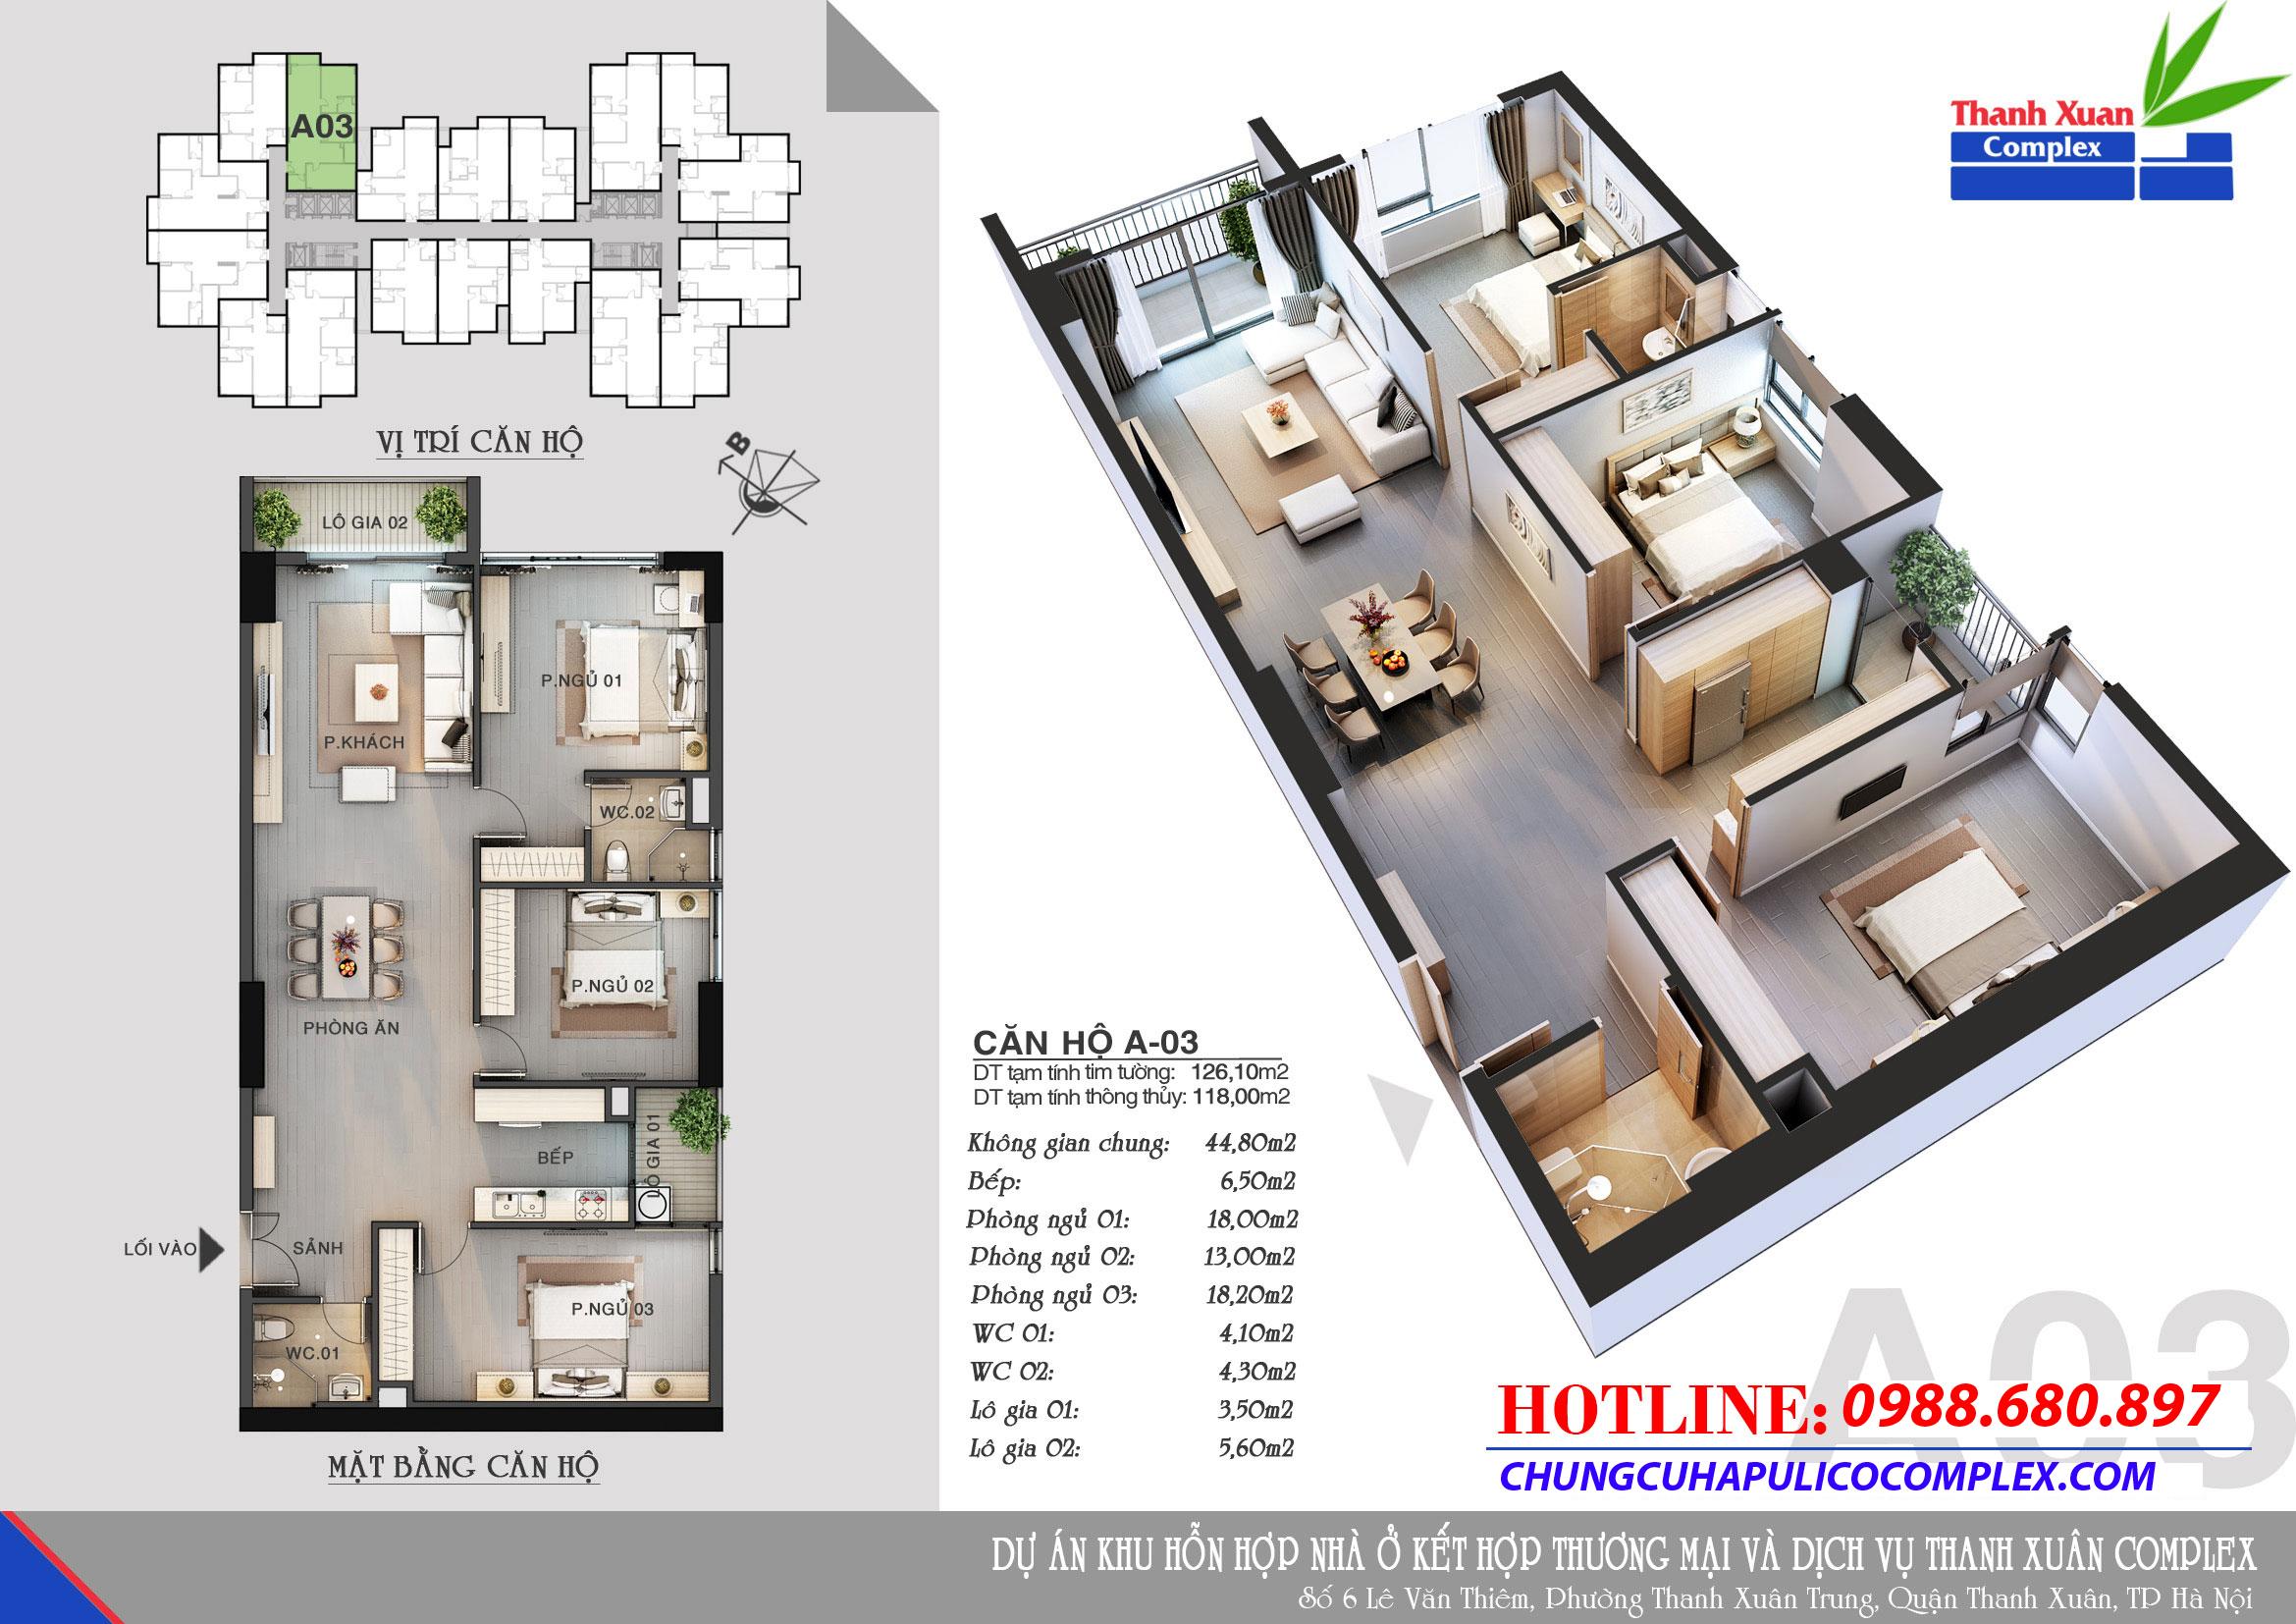 HSB_Thanhxuan-complex_CH-A03_suachotT42016-copy